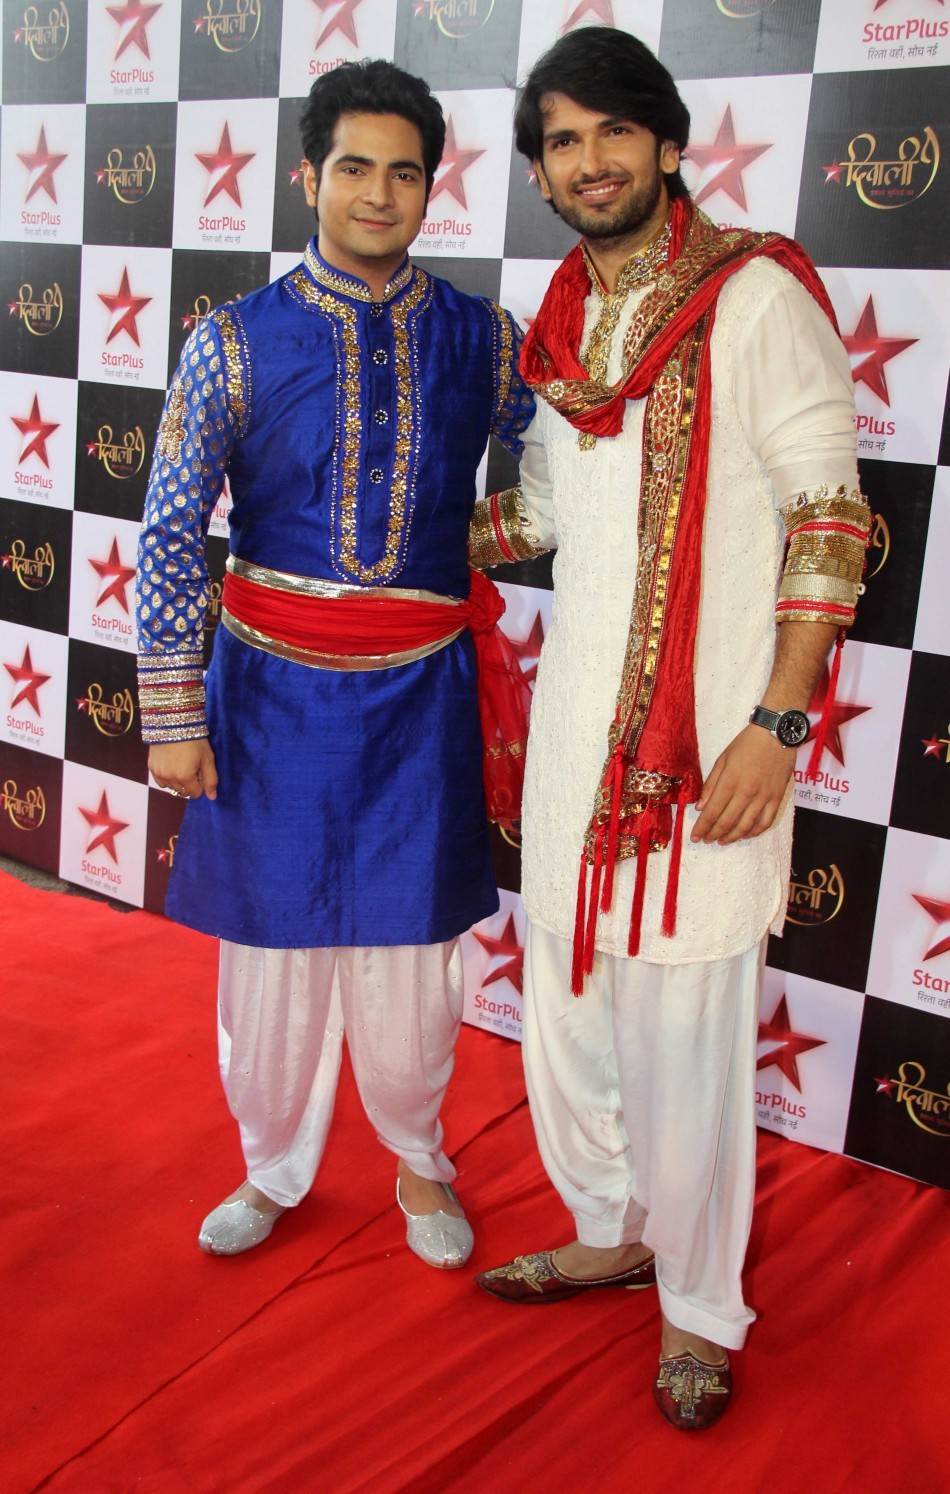 Karan Mehra, Rahul Sharma